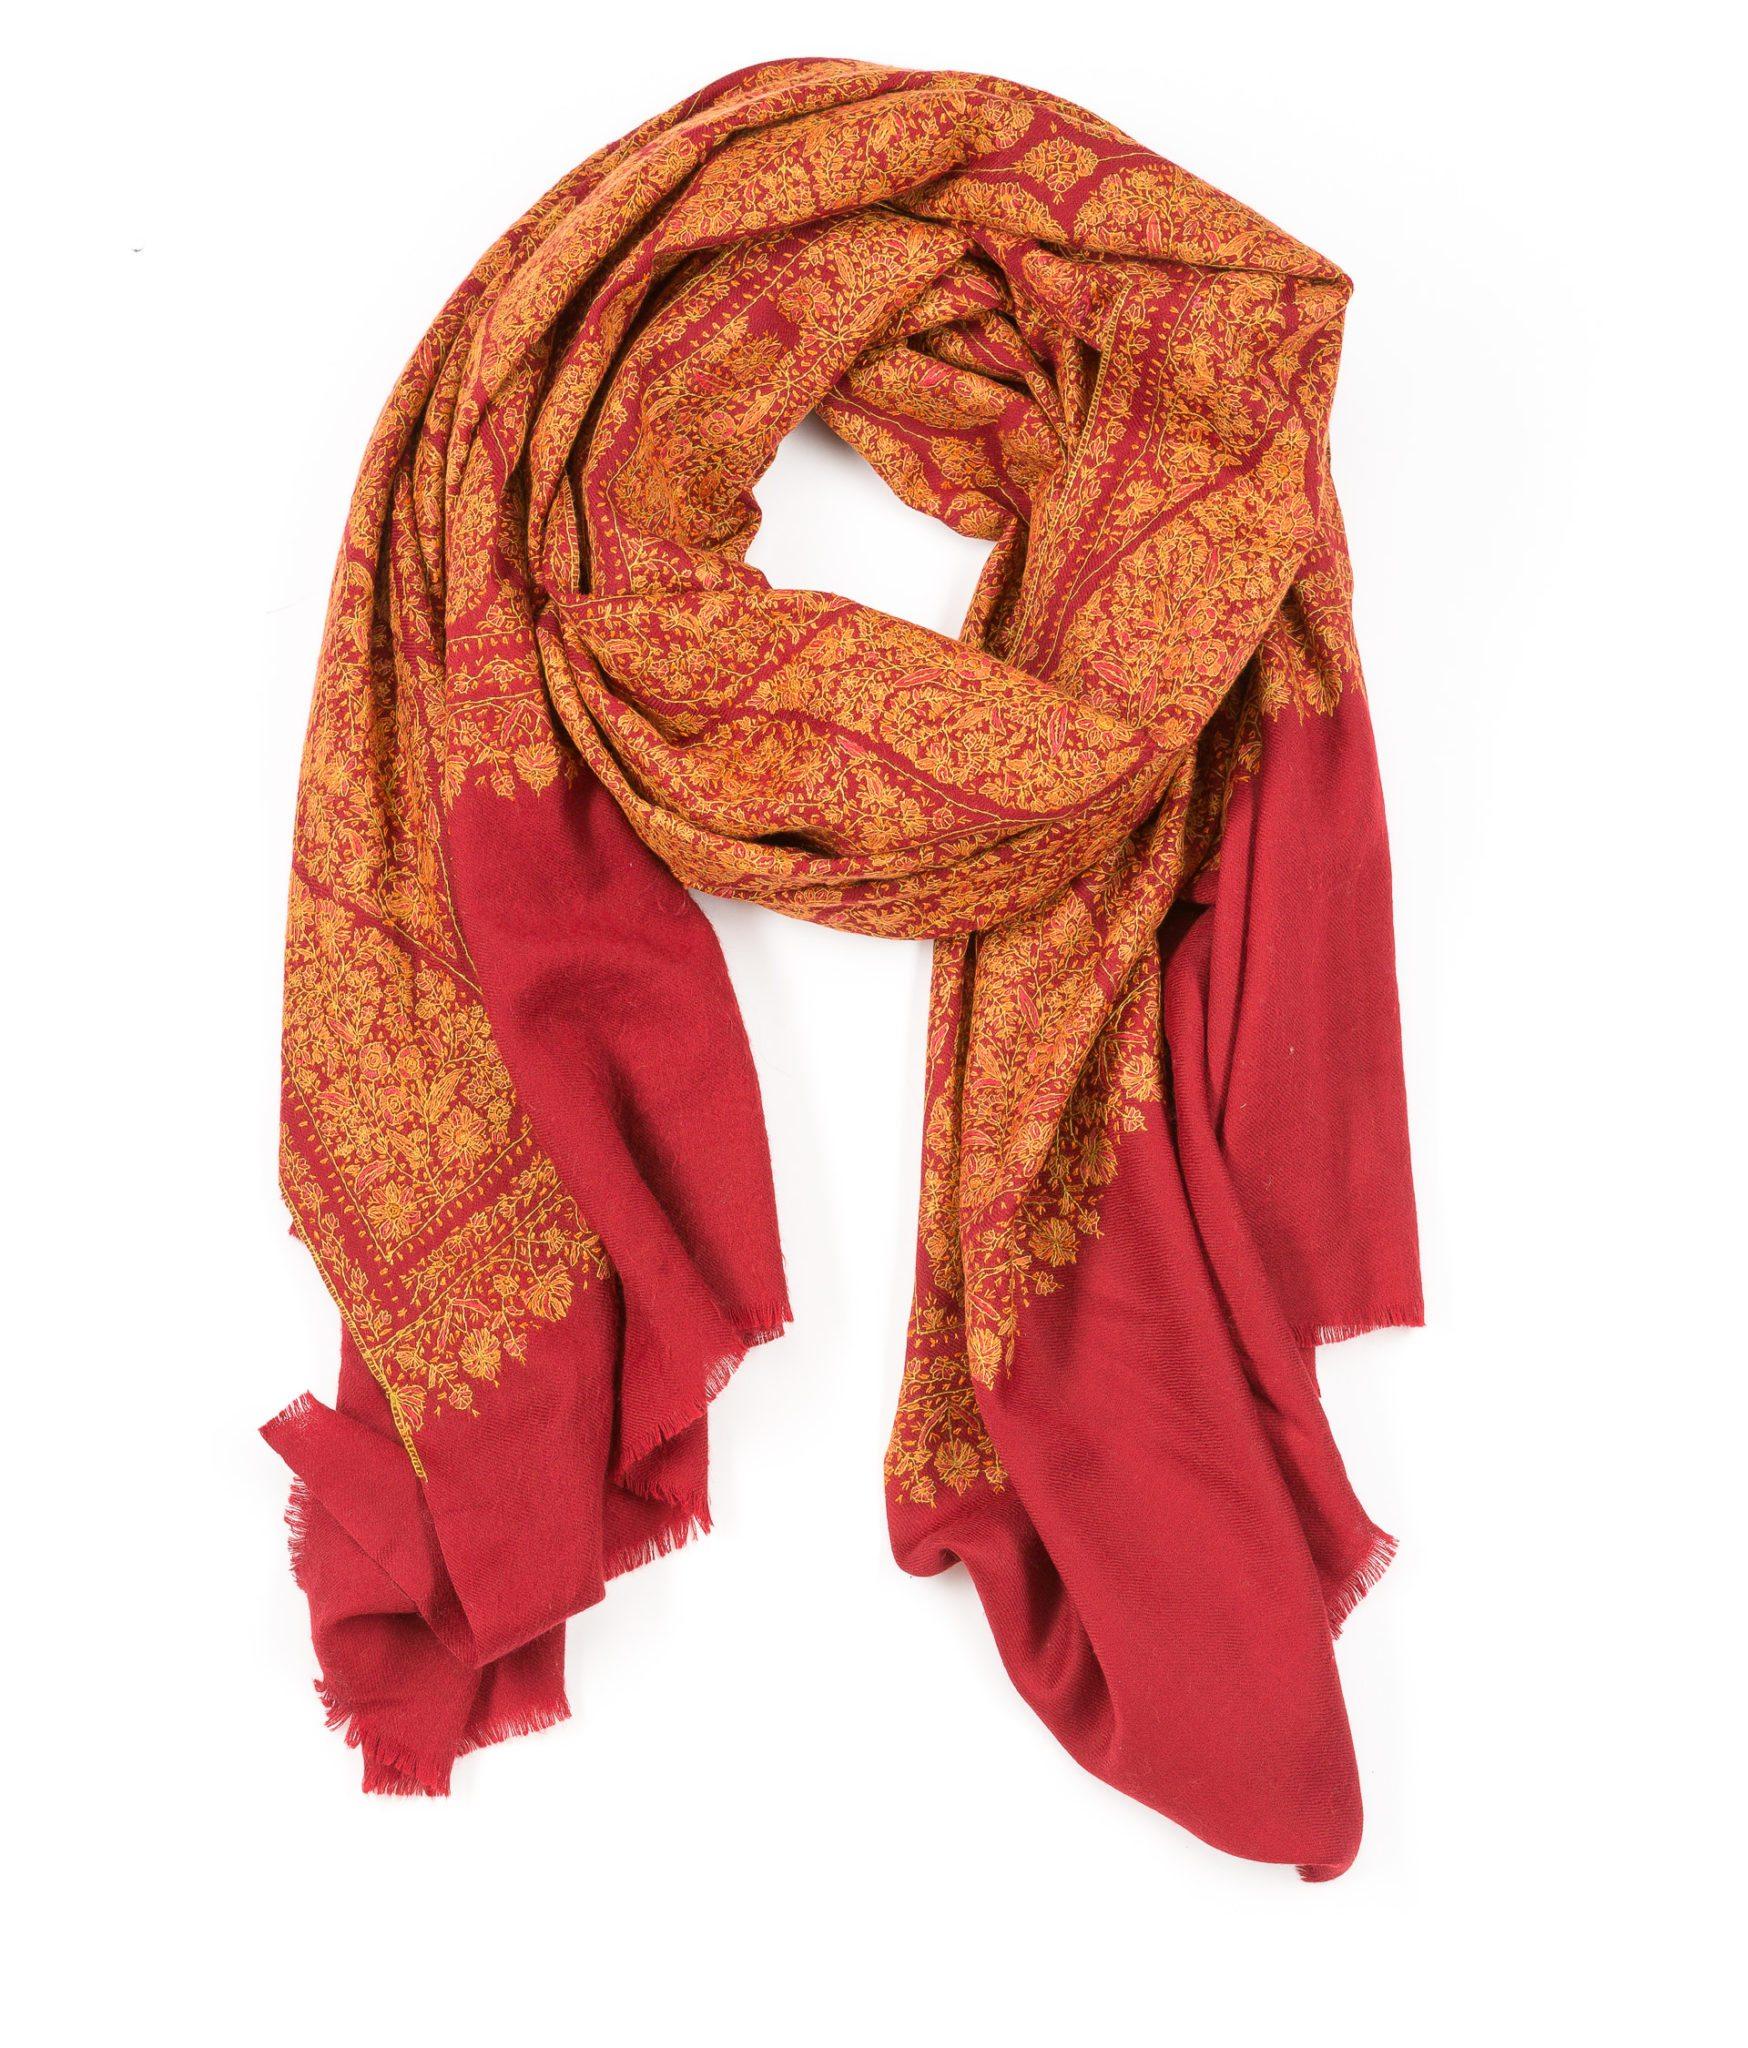 cashmere pashmina scarf 1278 1 510x600 cashmere pashmina scarf wxrkobj